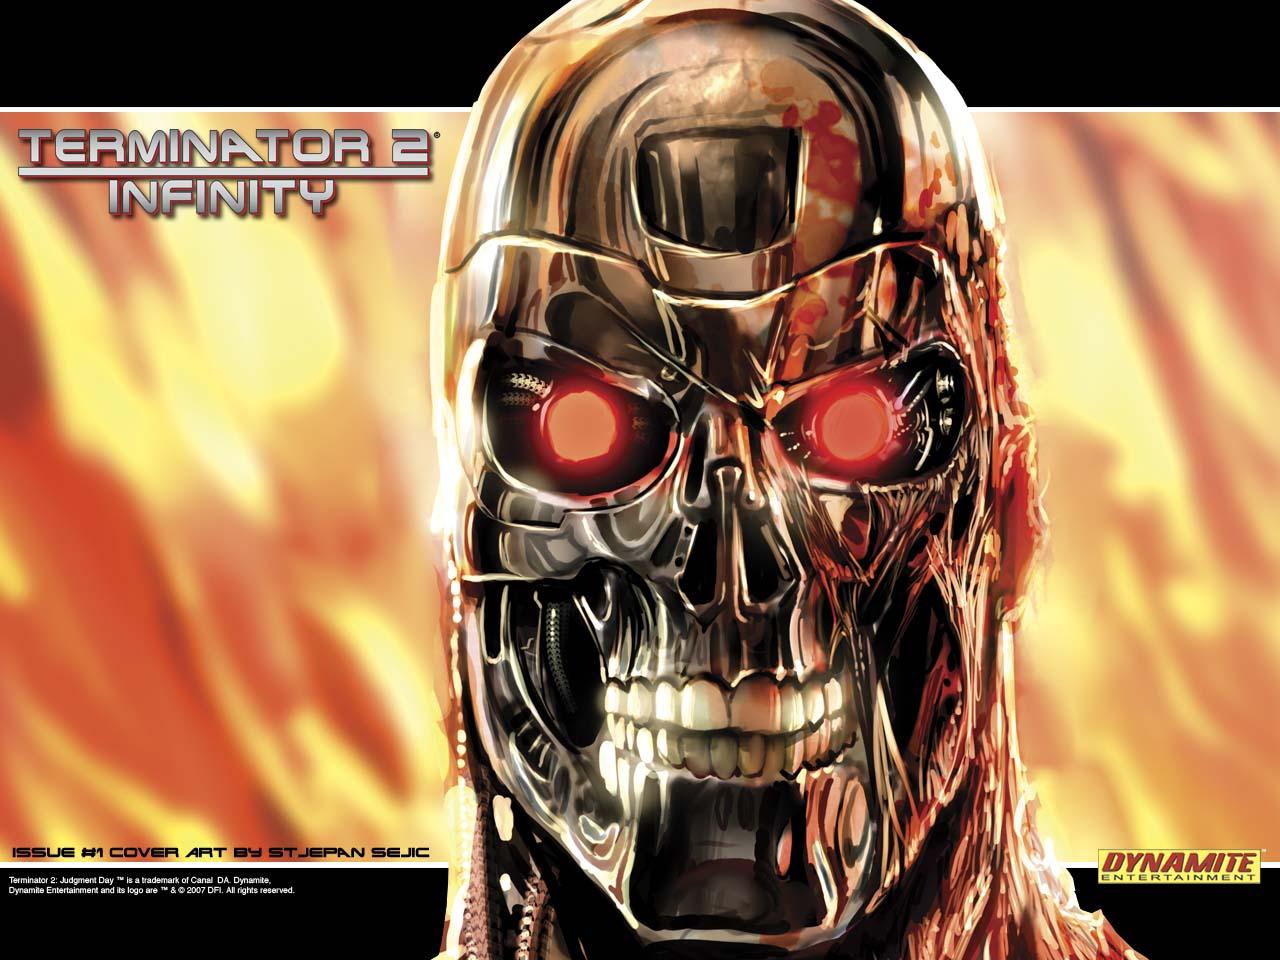 High Resolution Wallpaper | Terminator 5 Infinity 1280x960 px